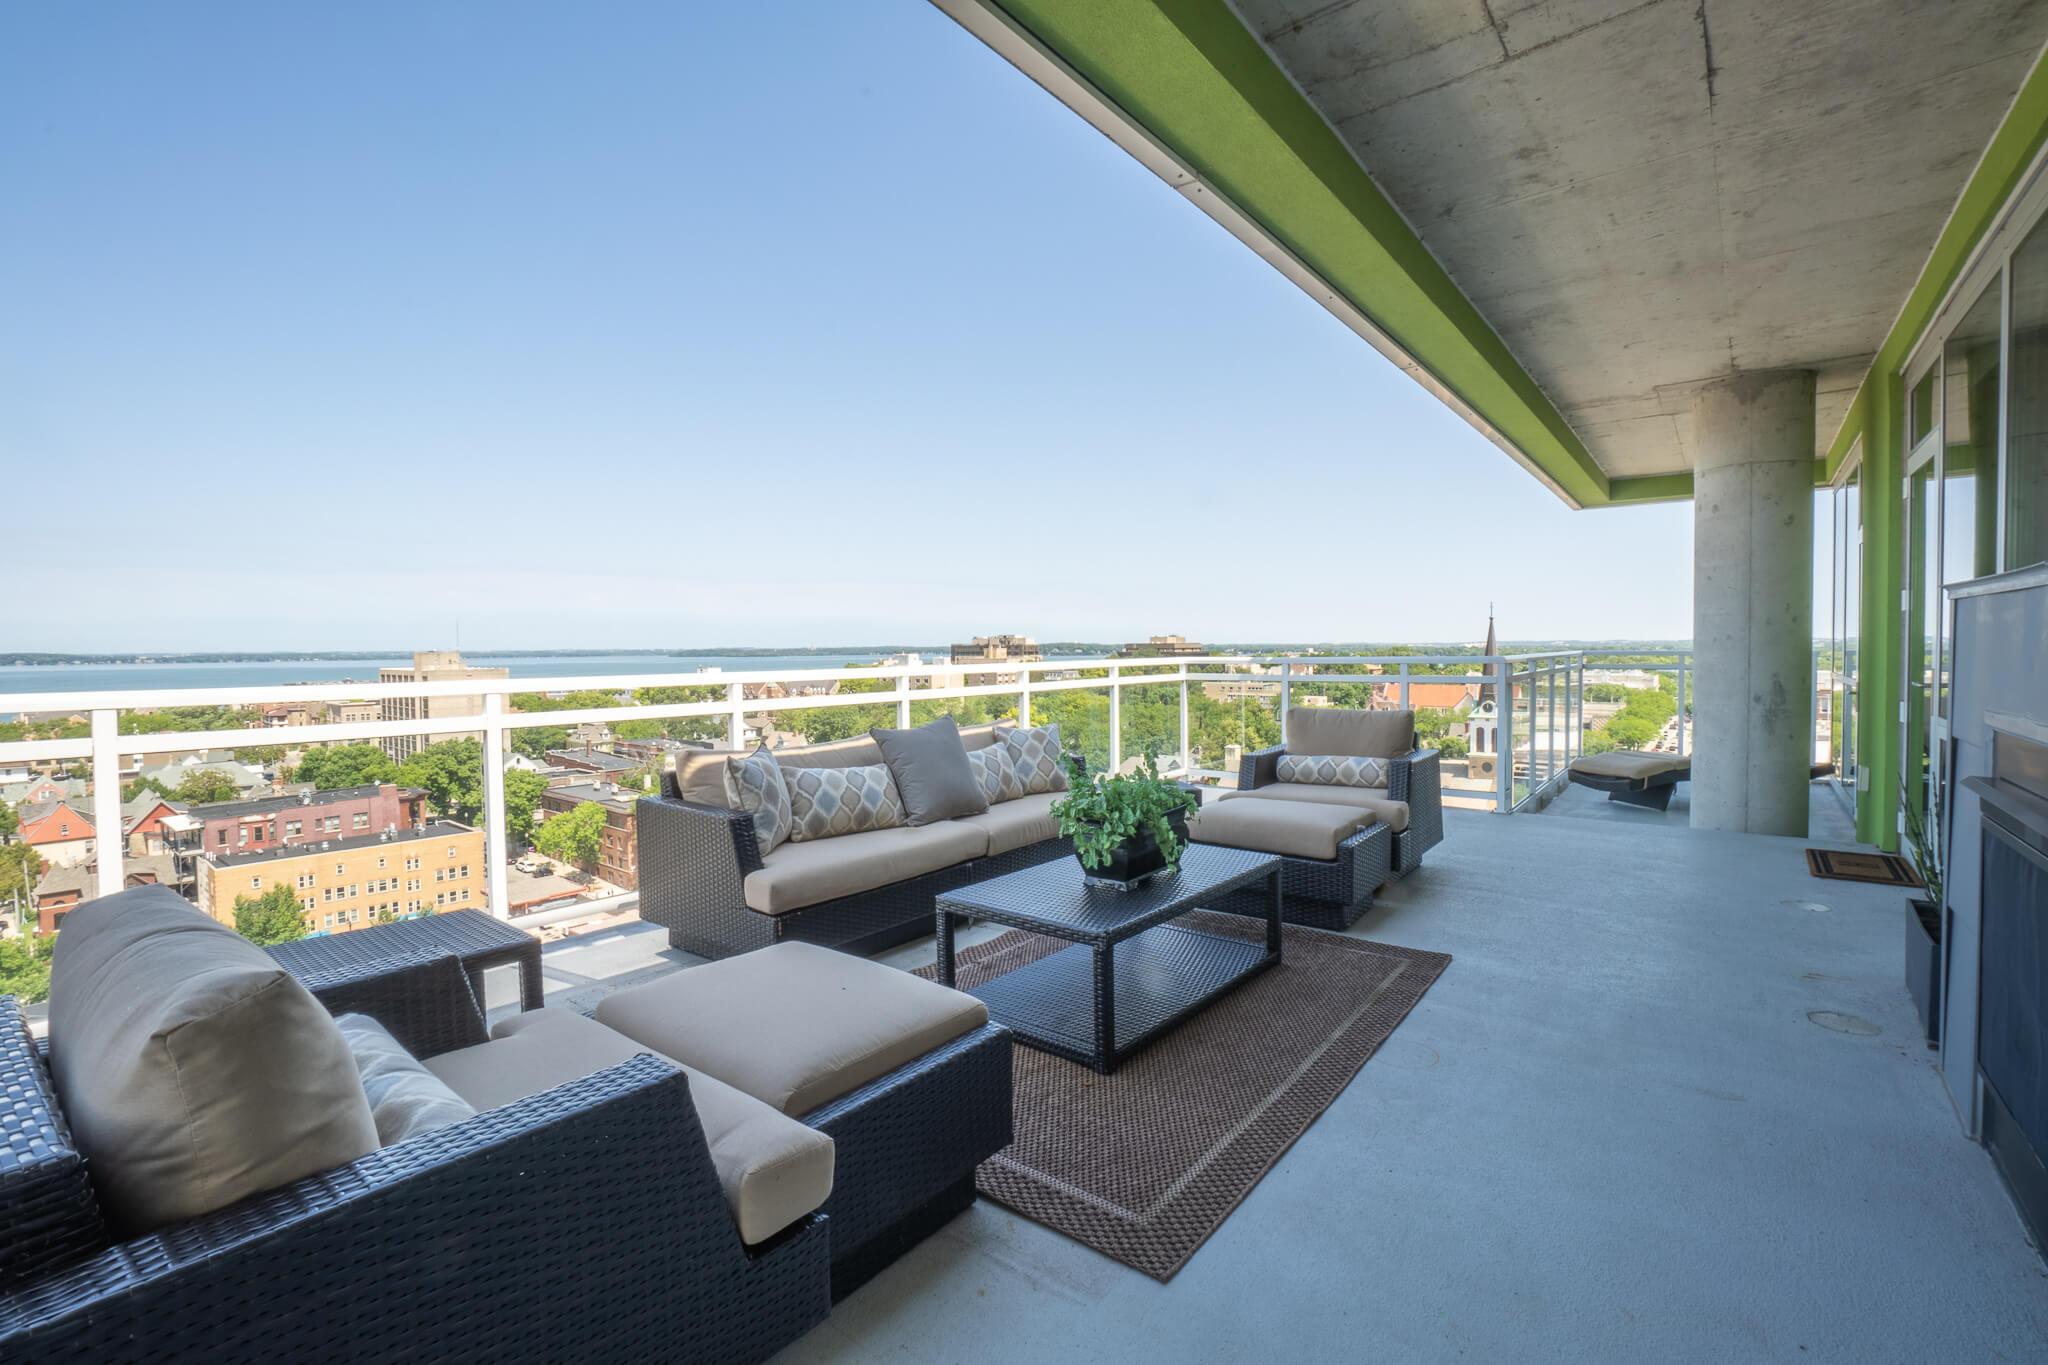 patio-seating-area-12th-floor-apartment-madison